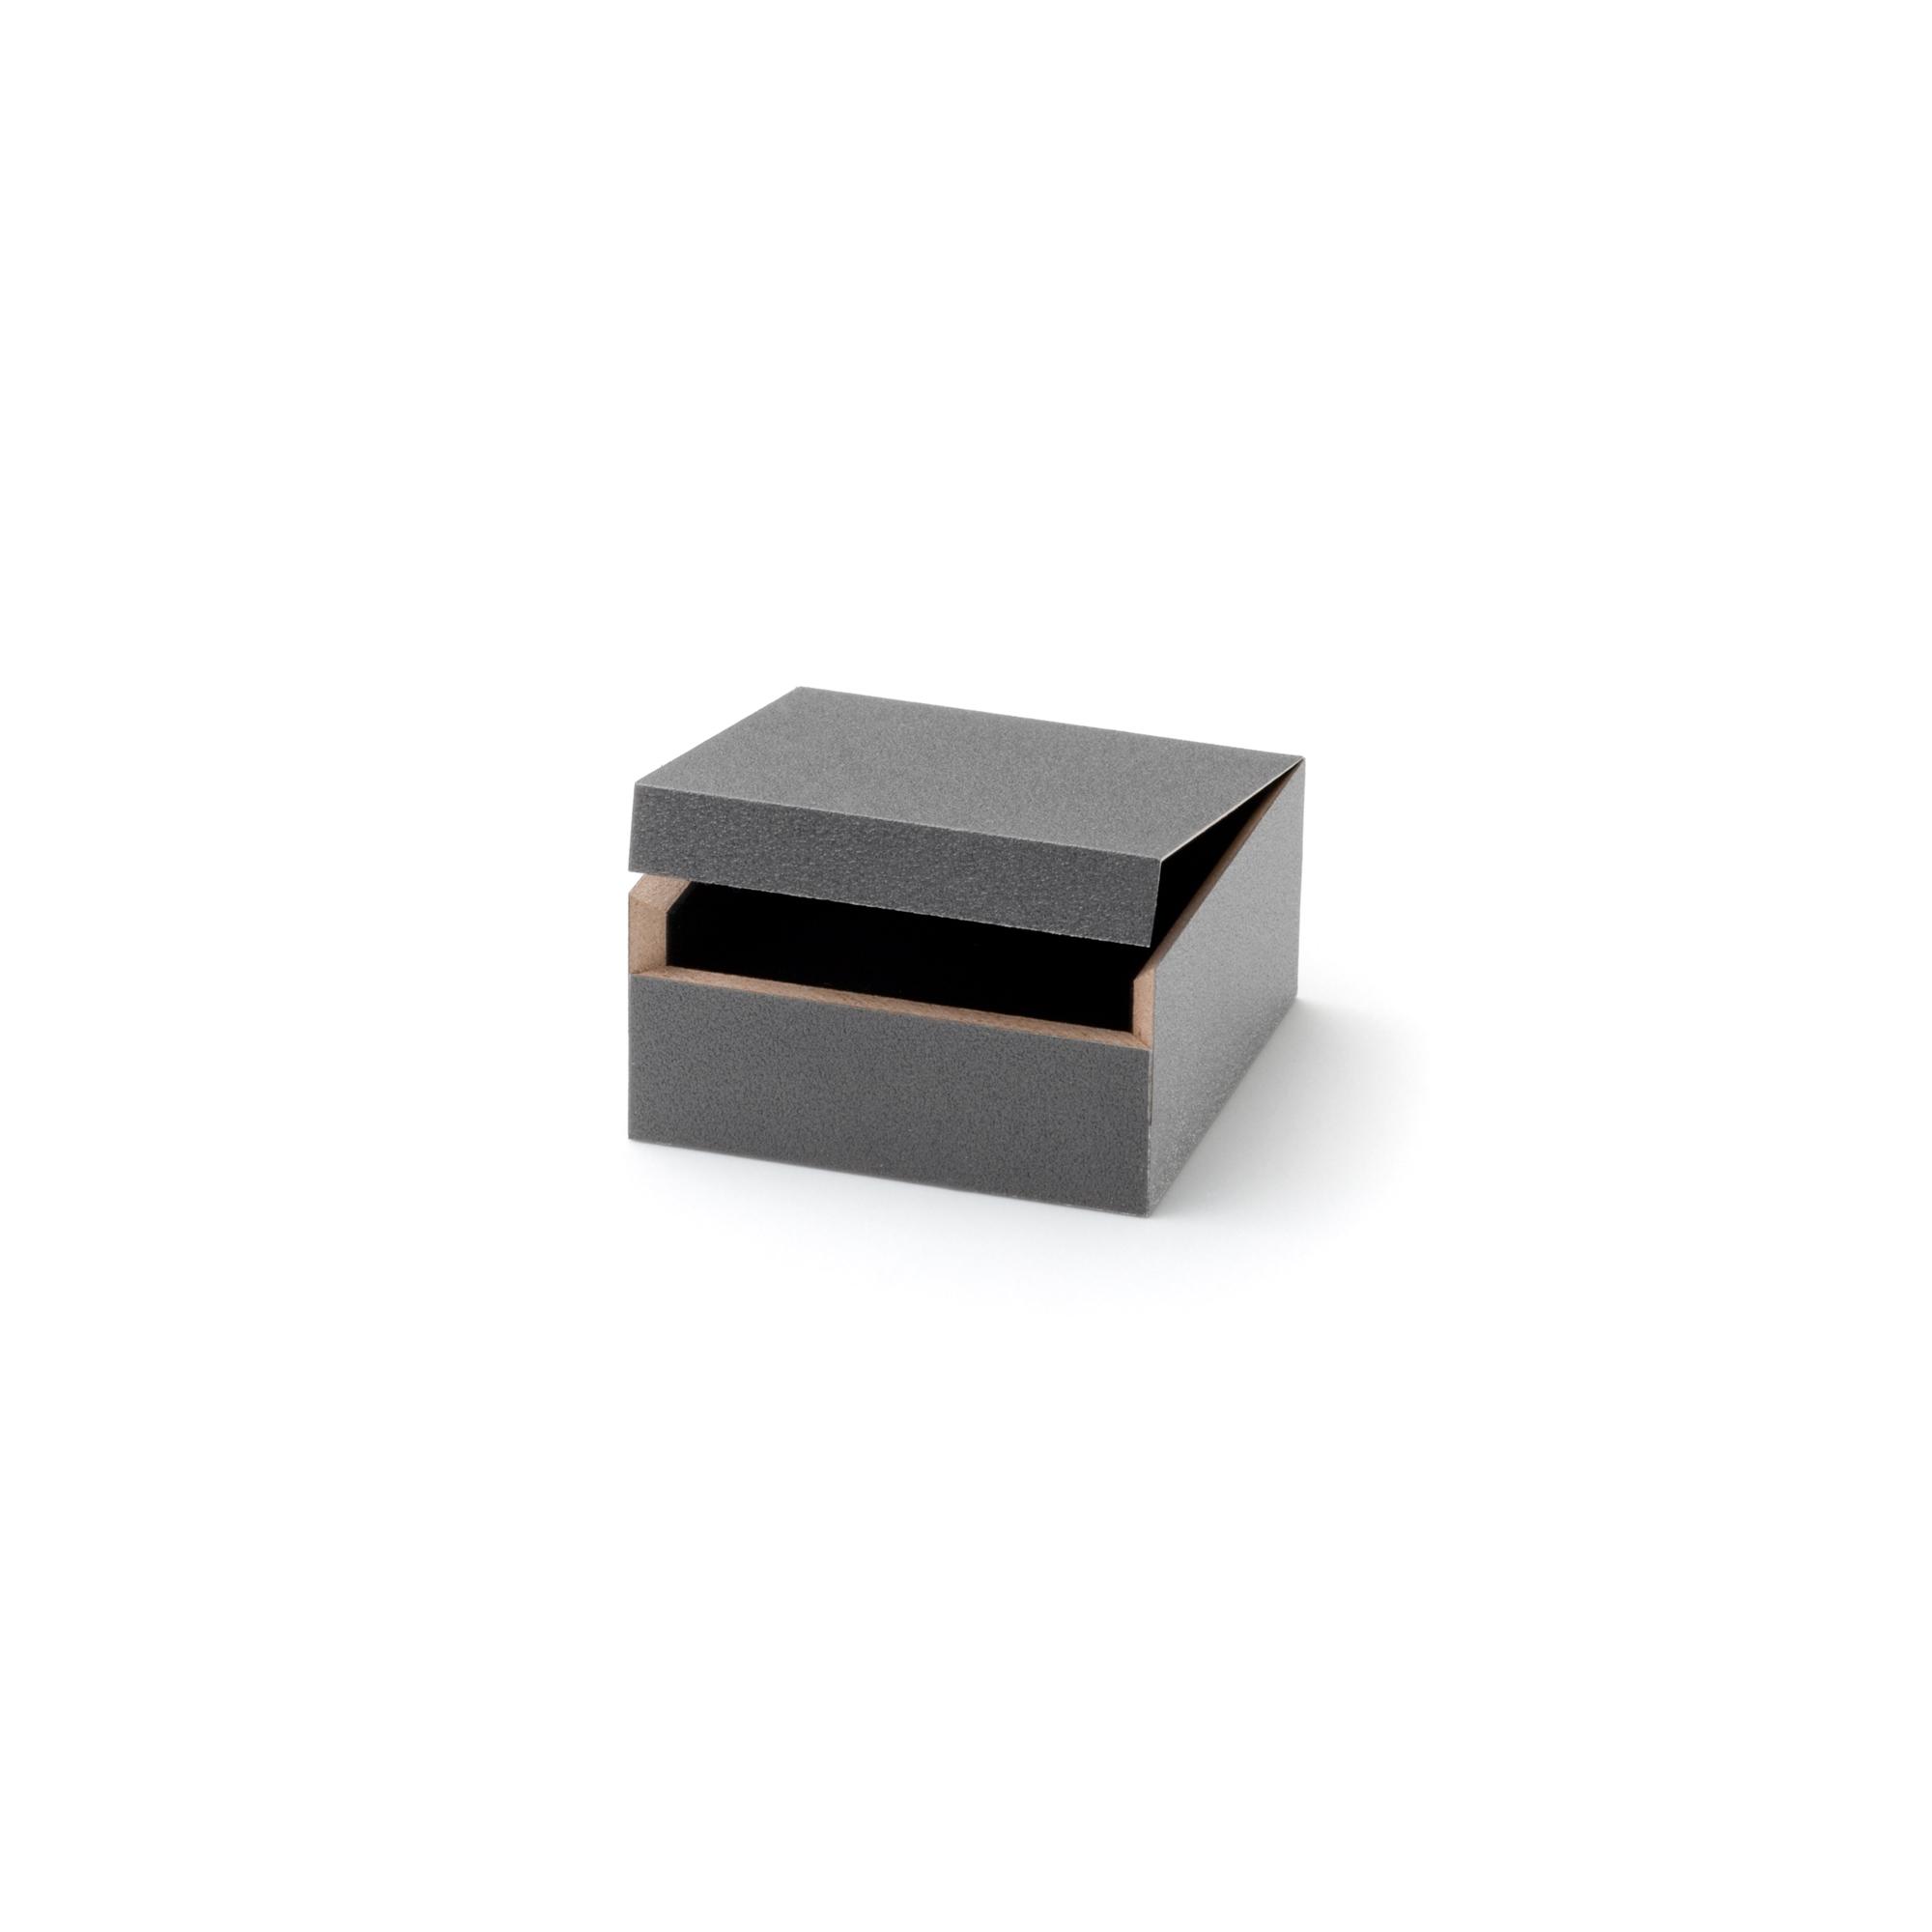 GREYBOX universal small